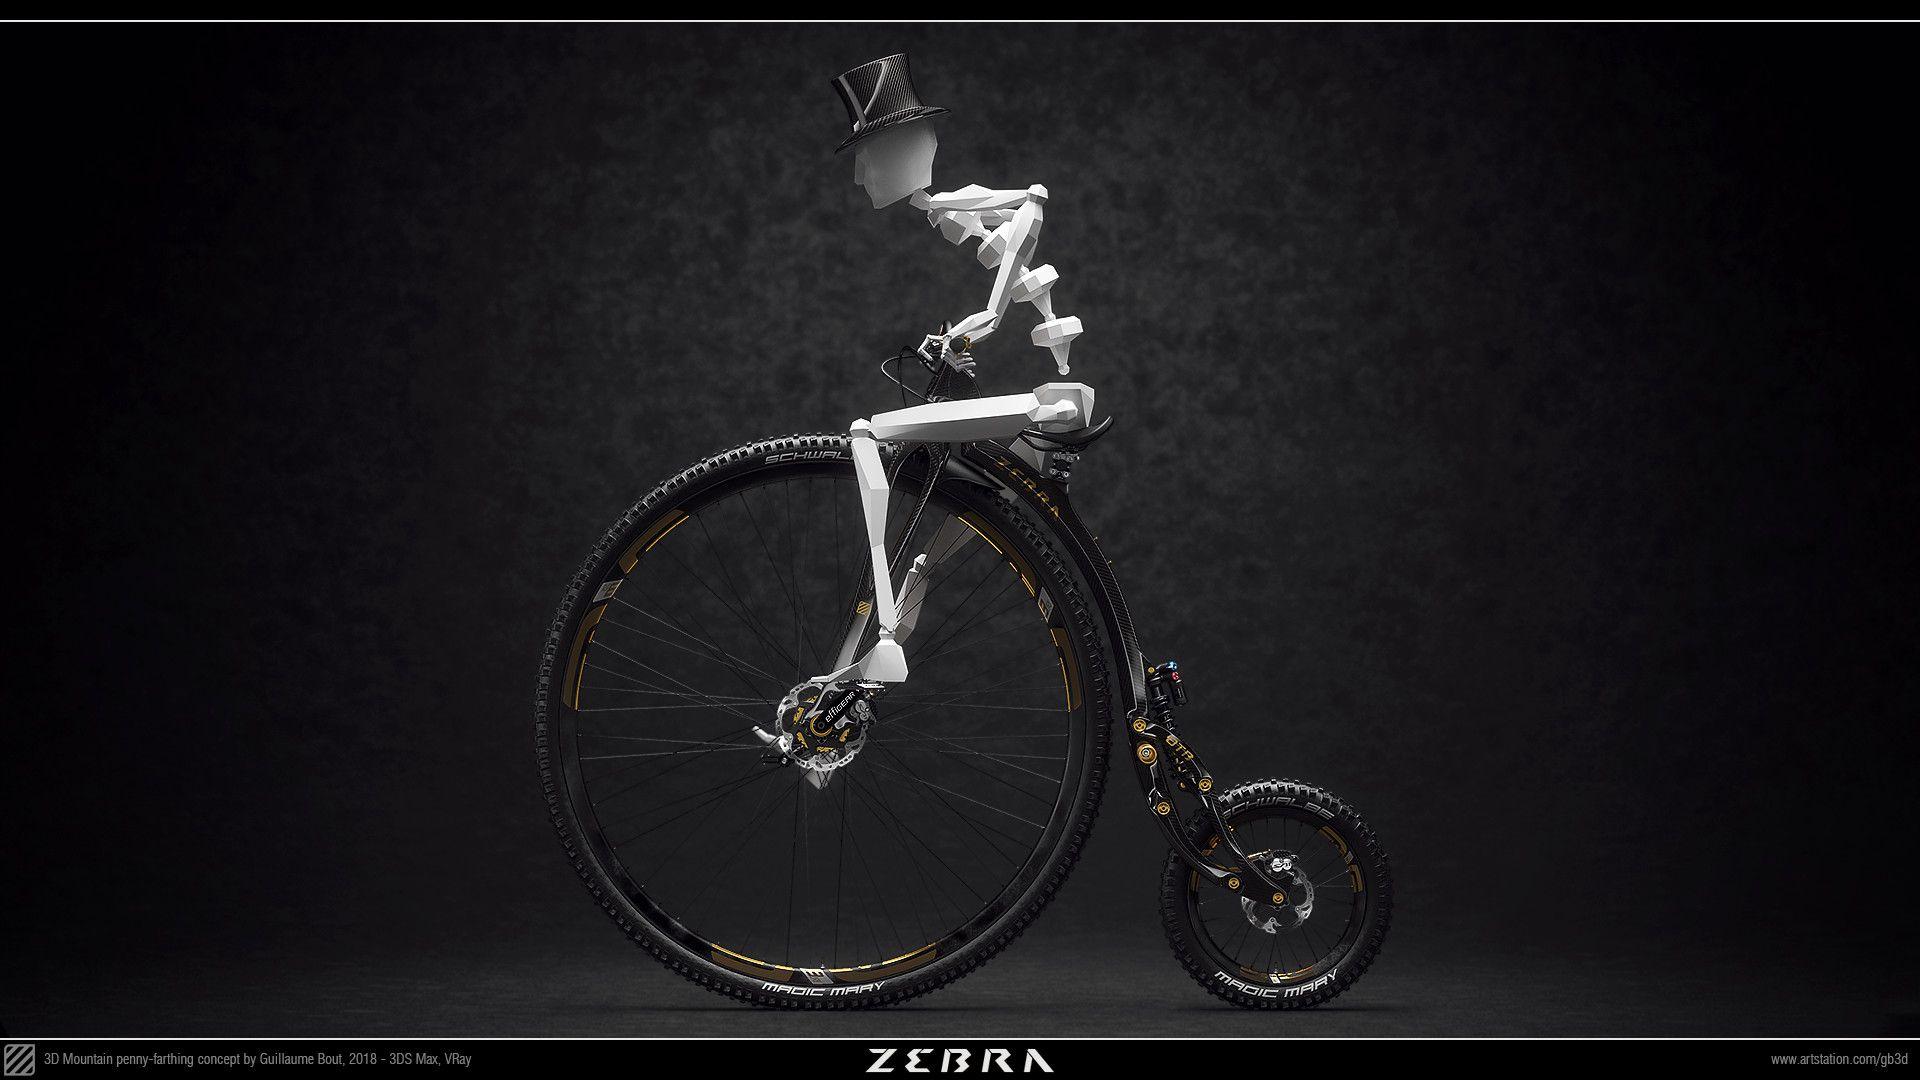 Artstation Zebra Otb 21st Century Mountain Penny Farthing Guillaume Bout Penny Farthing Bike Bout